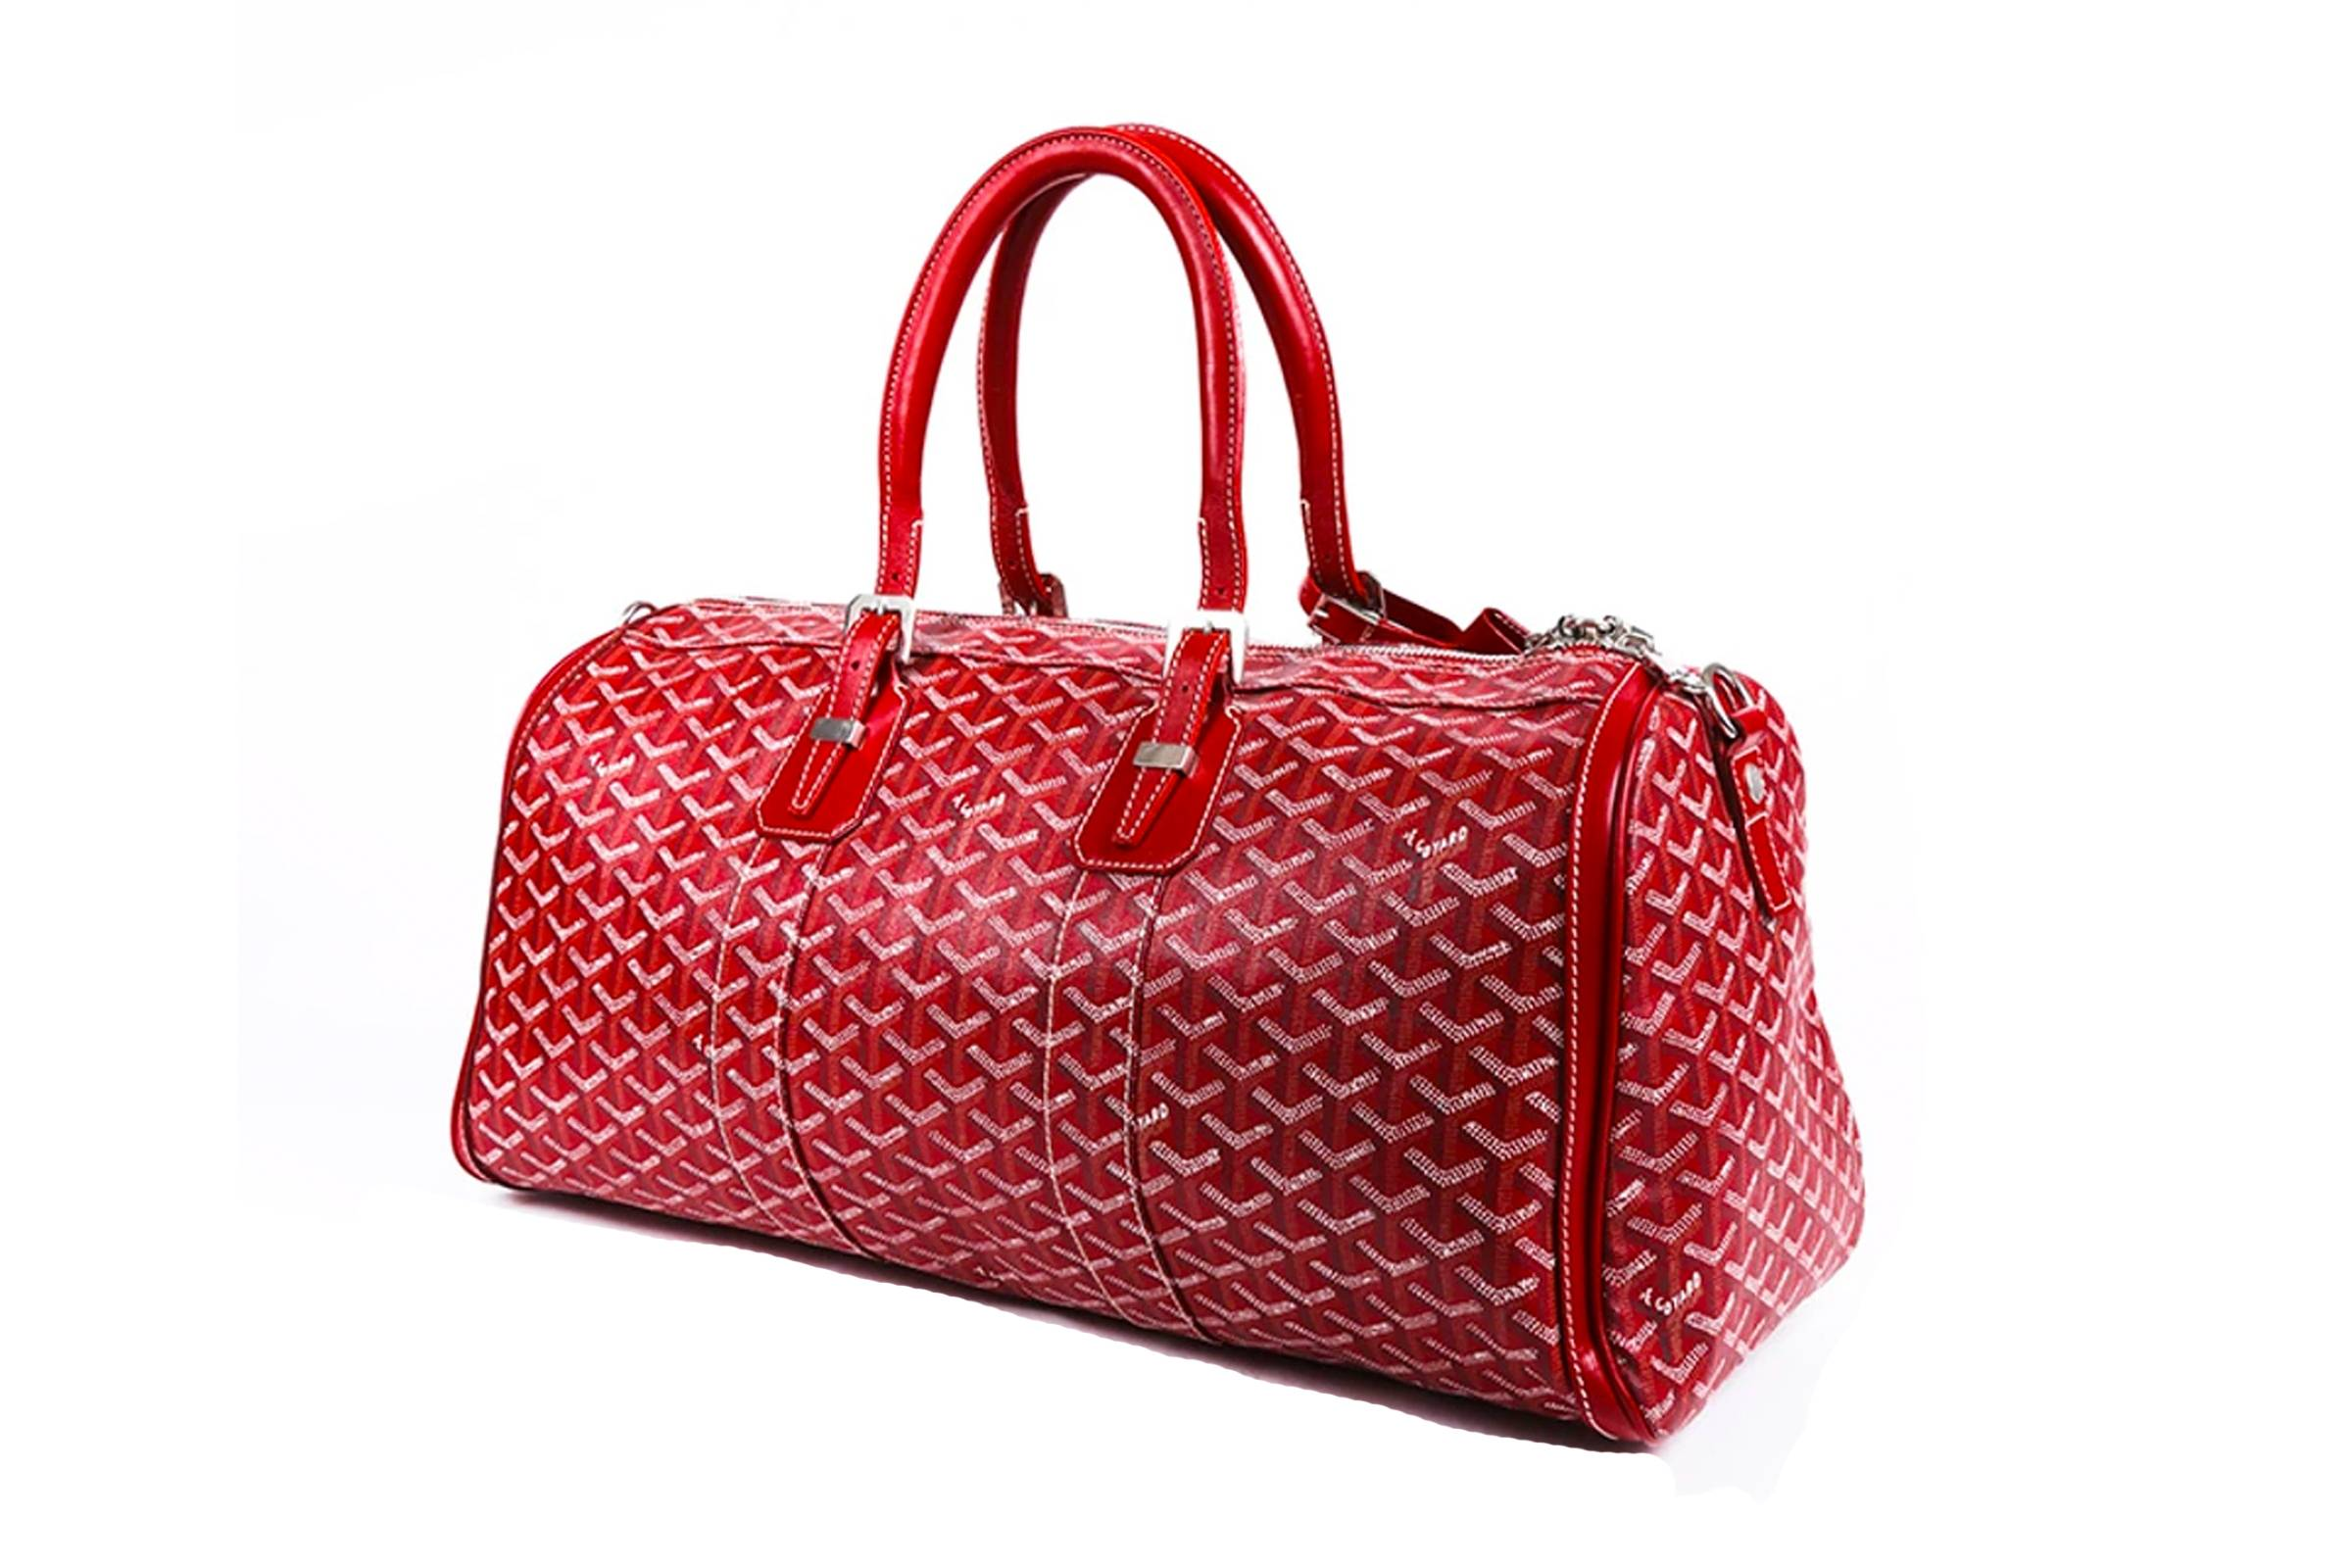 Goyard Red 50 Croisière Keepall Duffle Bag